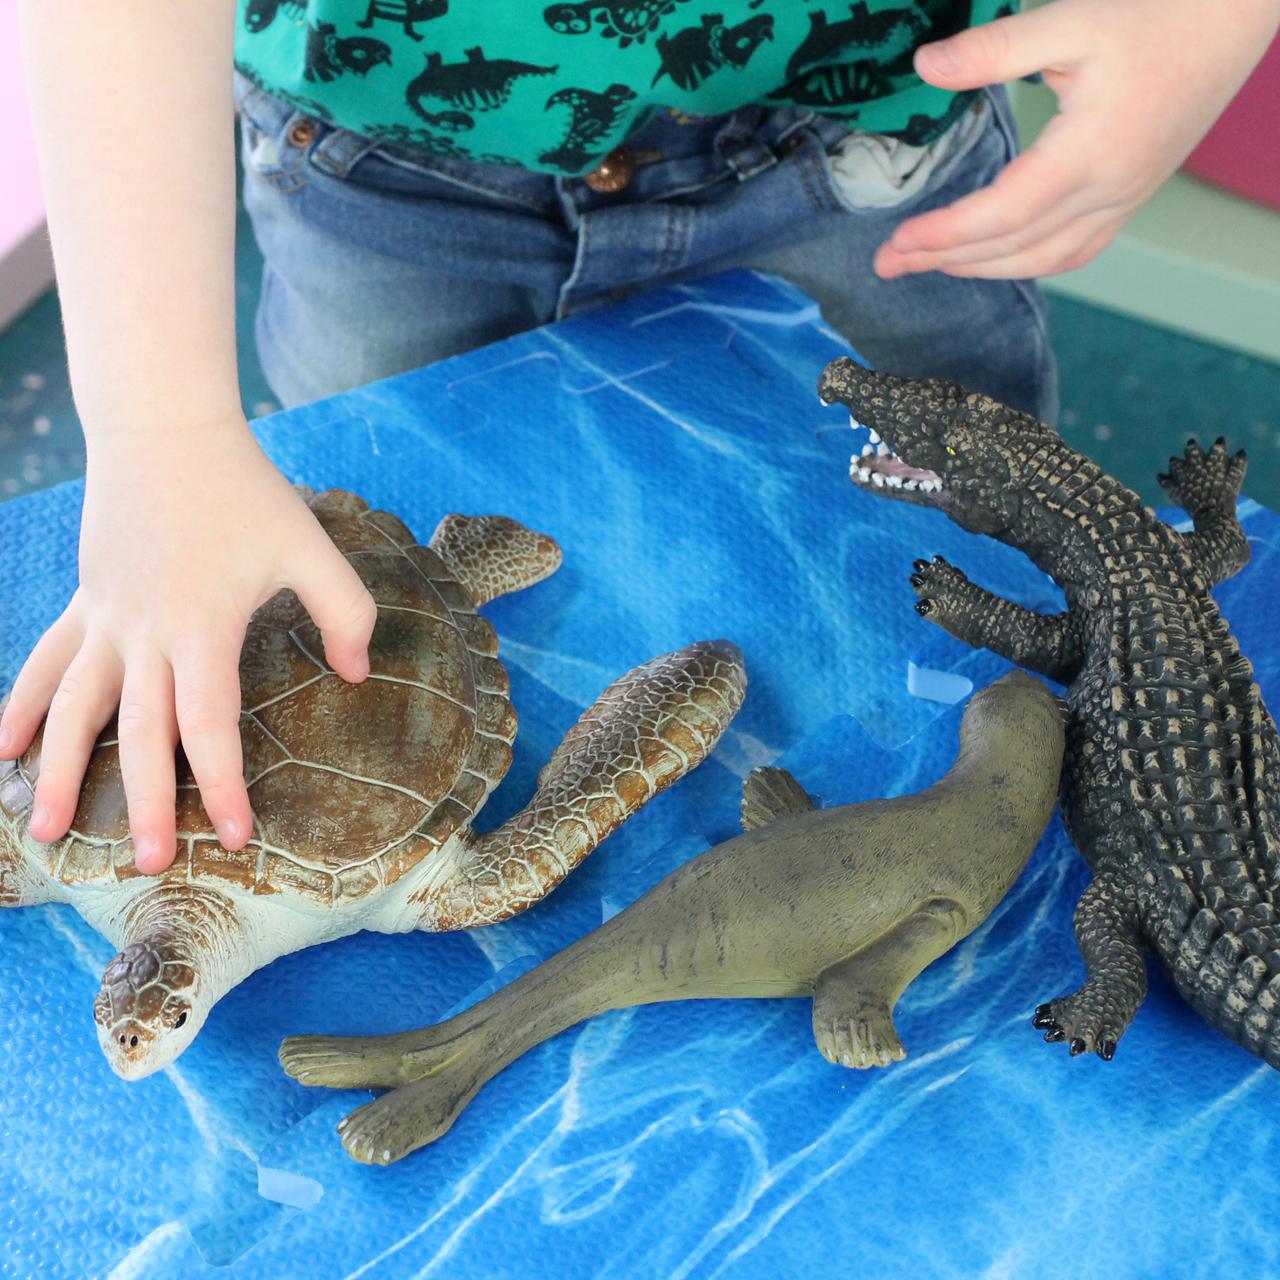 Medium Seal, Turtle and Croc Soft Feel 8 Inch